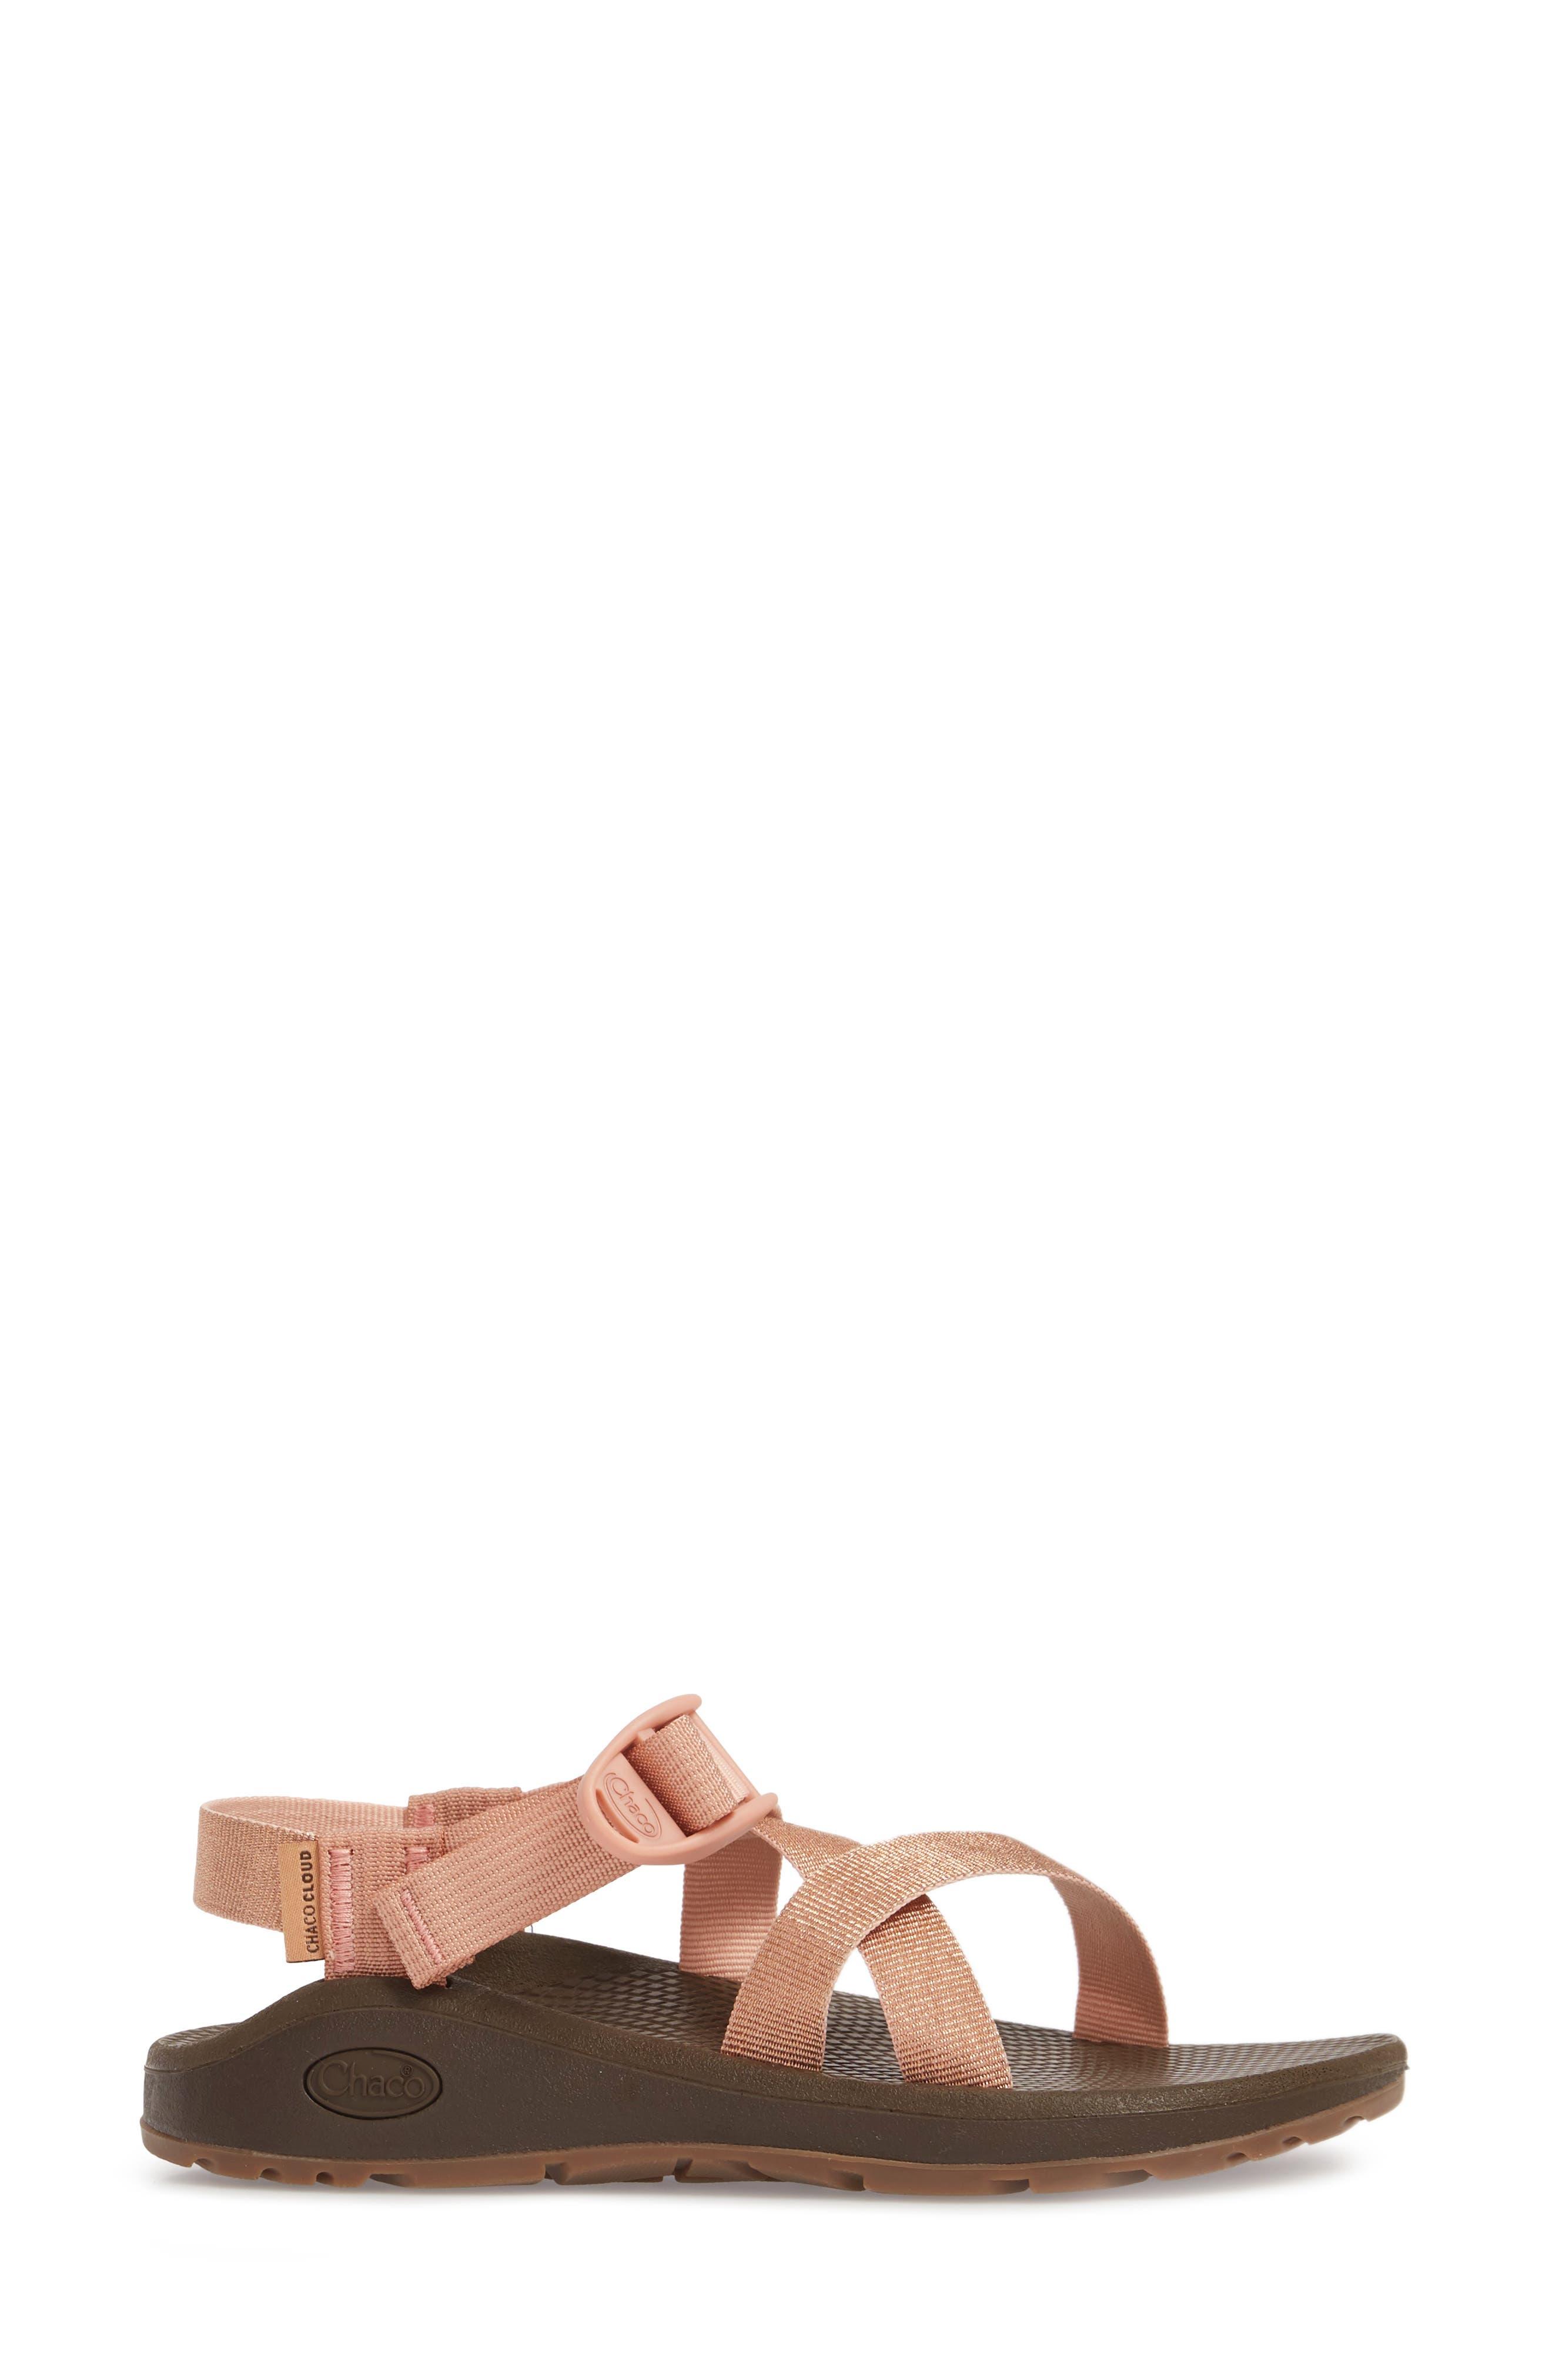 Z/Cloud Sandal,                             Alternate thumbnail 3, color,                             Metallic Rose Leather